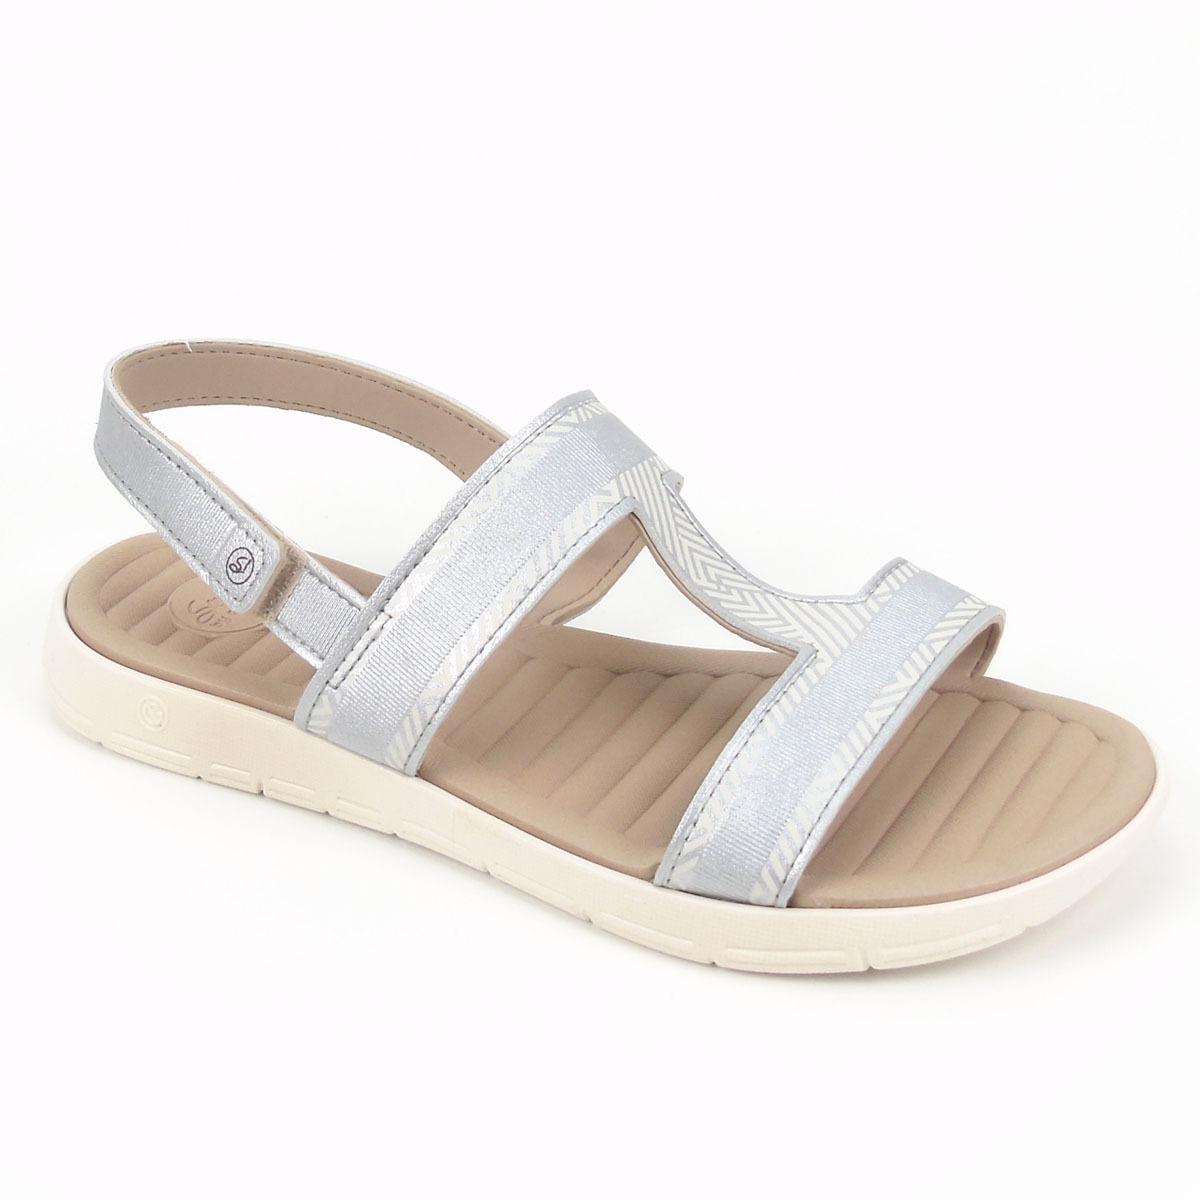 1103e18ad7 sandália macia rasteira grendha na cor prata sense soft ii. Carregando zoom.